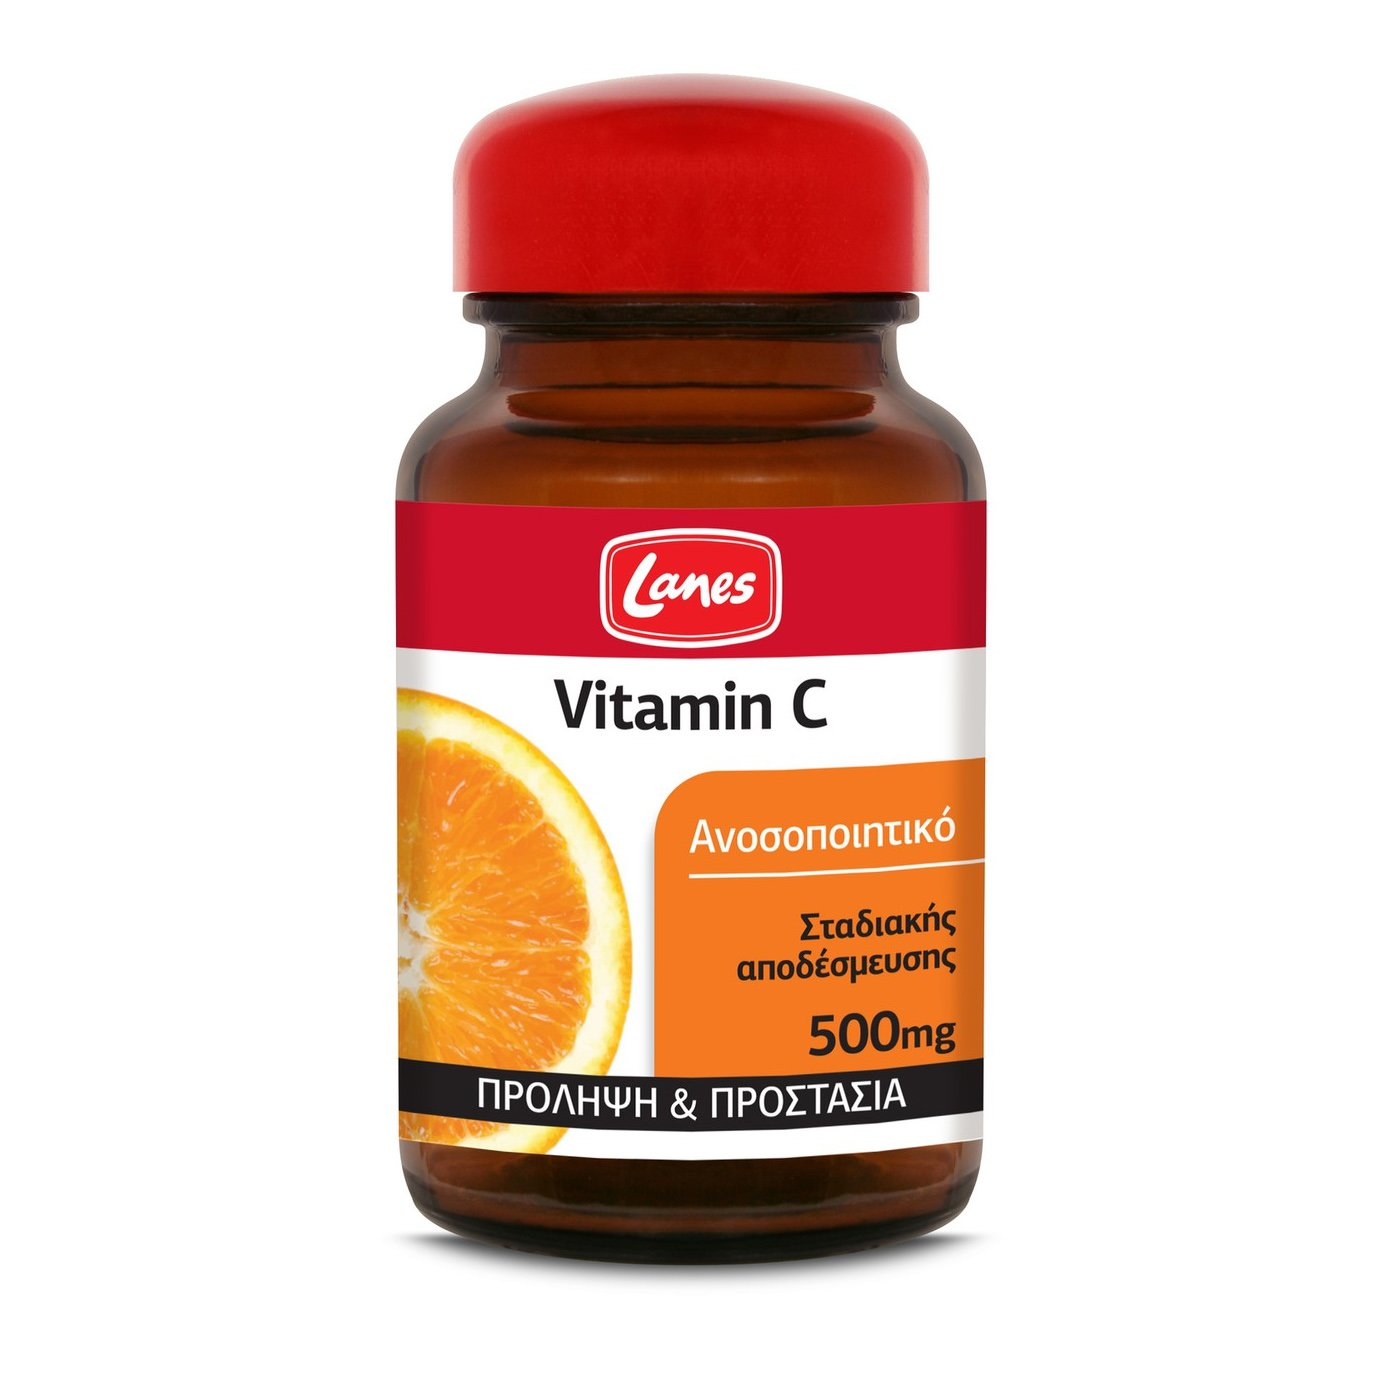 Lanes Vitamin C 500mg Συμπλήρωμα Διατροφής 30 tabs